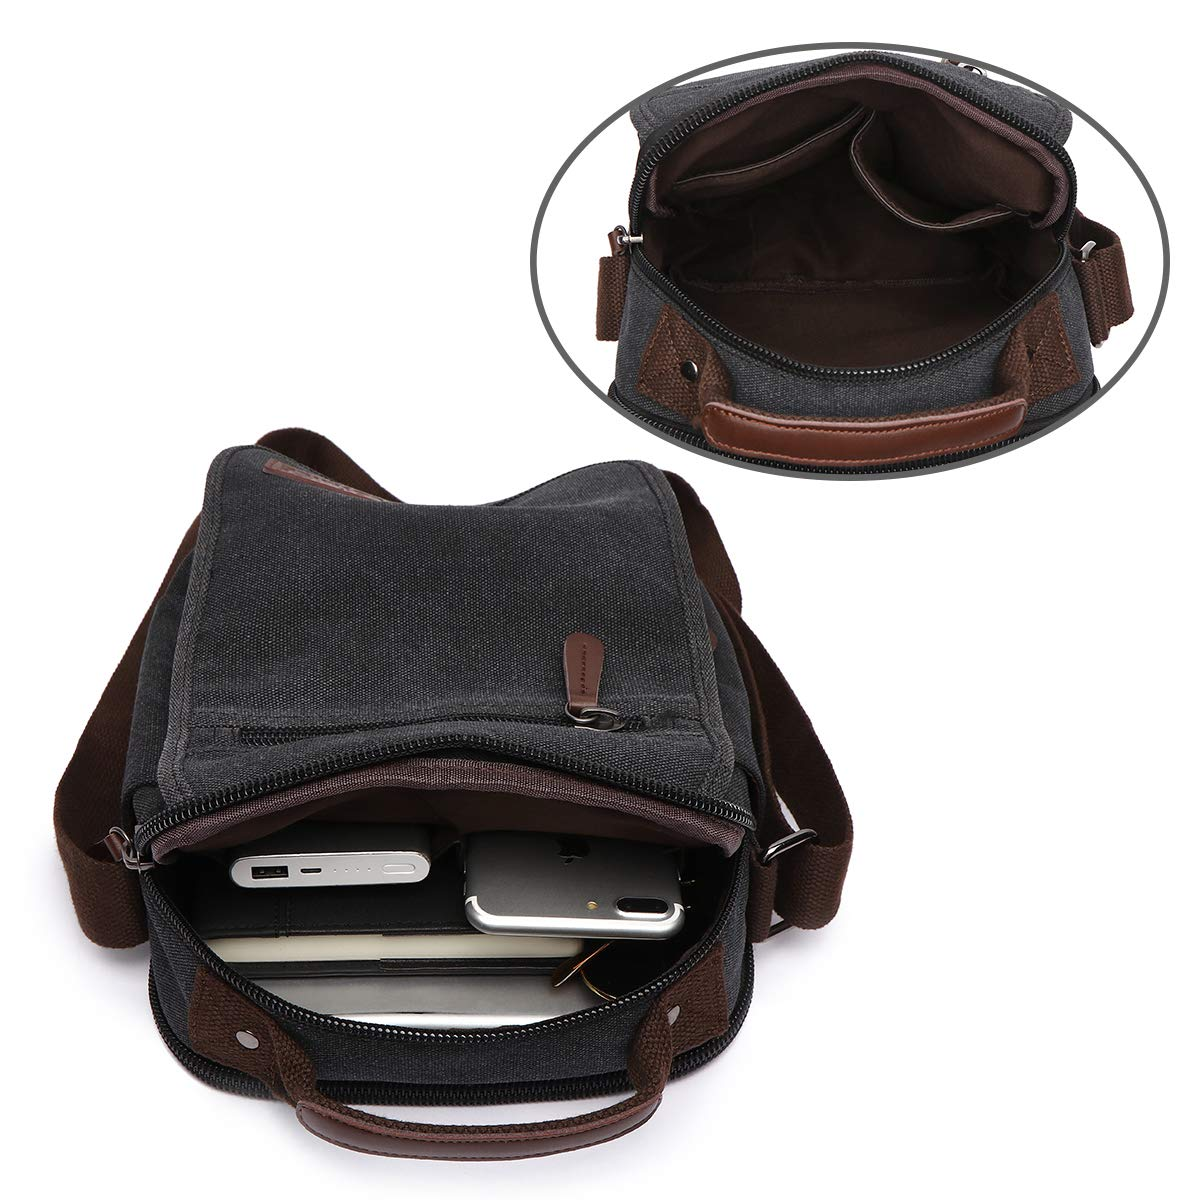 LOSMILE Bolsos Bandolera Hombre Pequeñas Bolsos de mano Bolsa de Hombro  Messenger Bag Bolsa de Lona para iPad mini ... 627d5b83e1c1